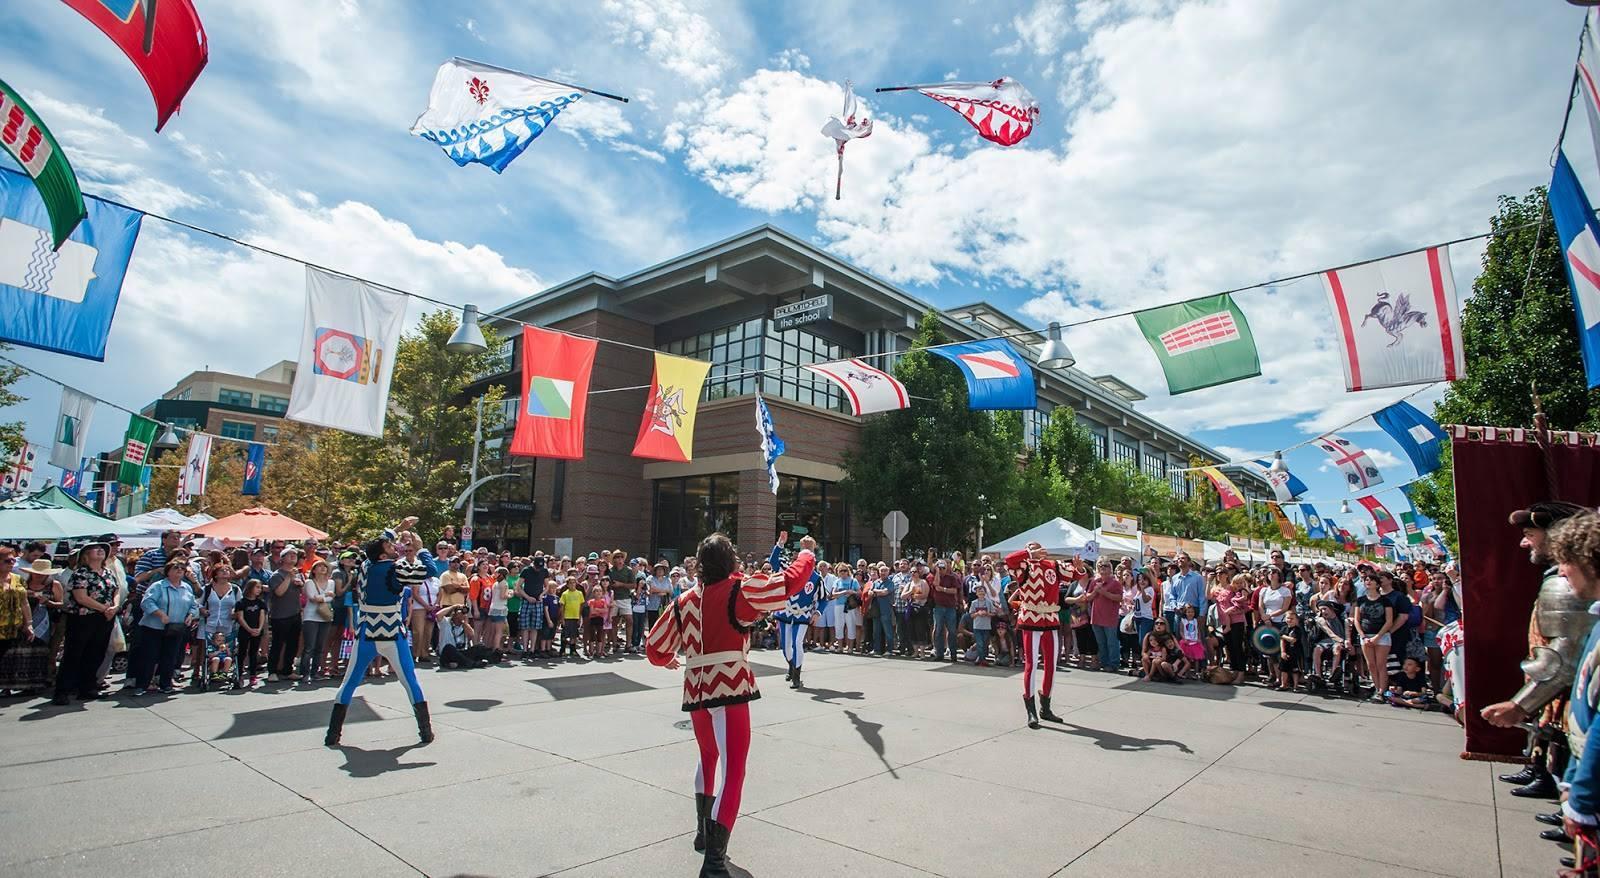 Festival Italiano at Belmar in Lakewood, CO